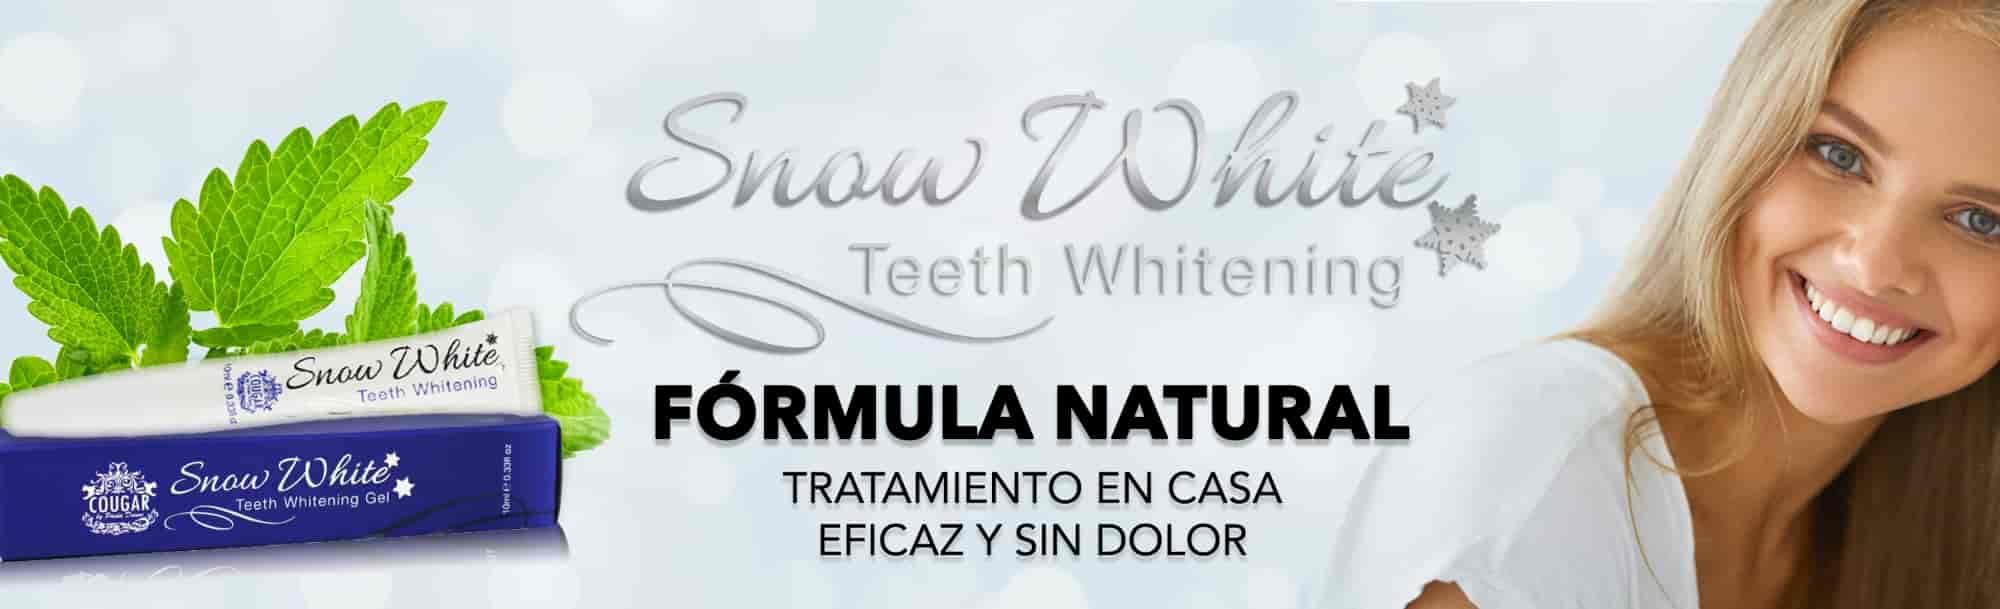 kits de blanqueamiento dental natural